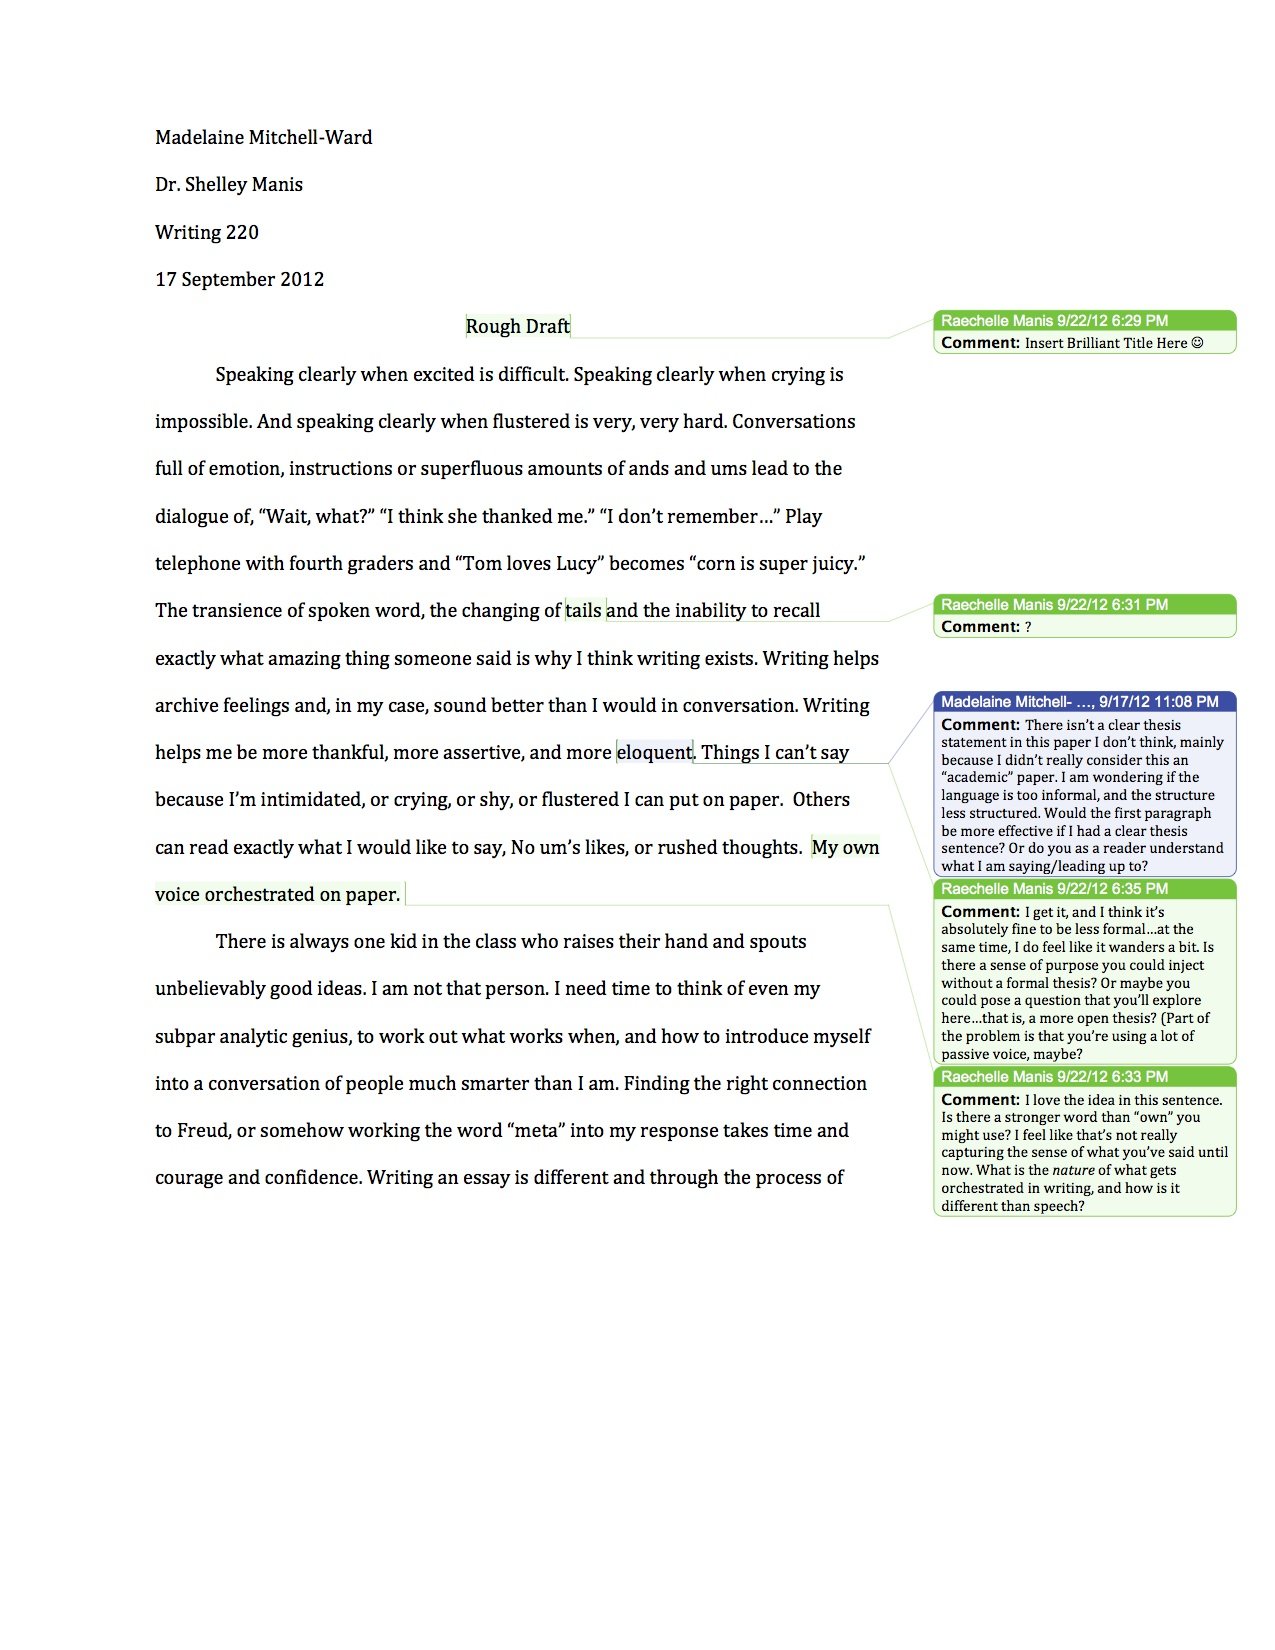 Worksheets The Westing Game Worksheets Waytoohuman Free